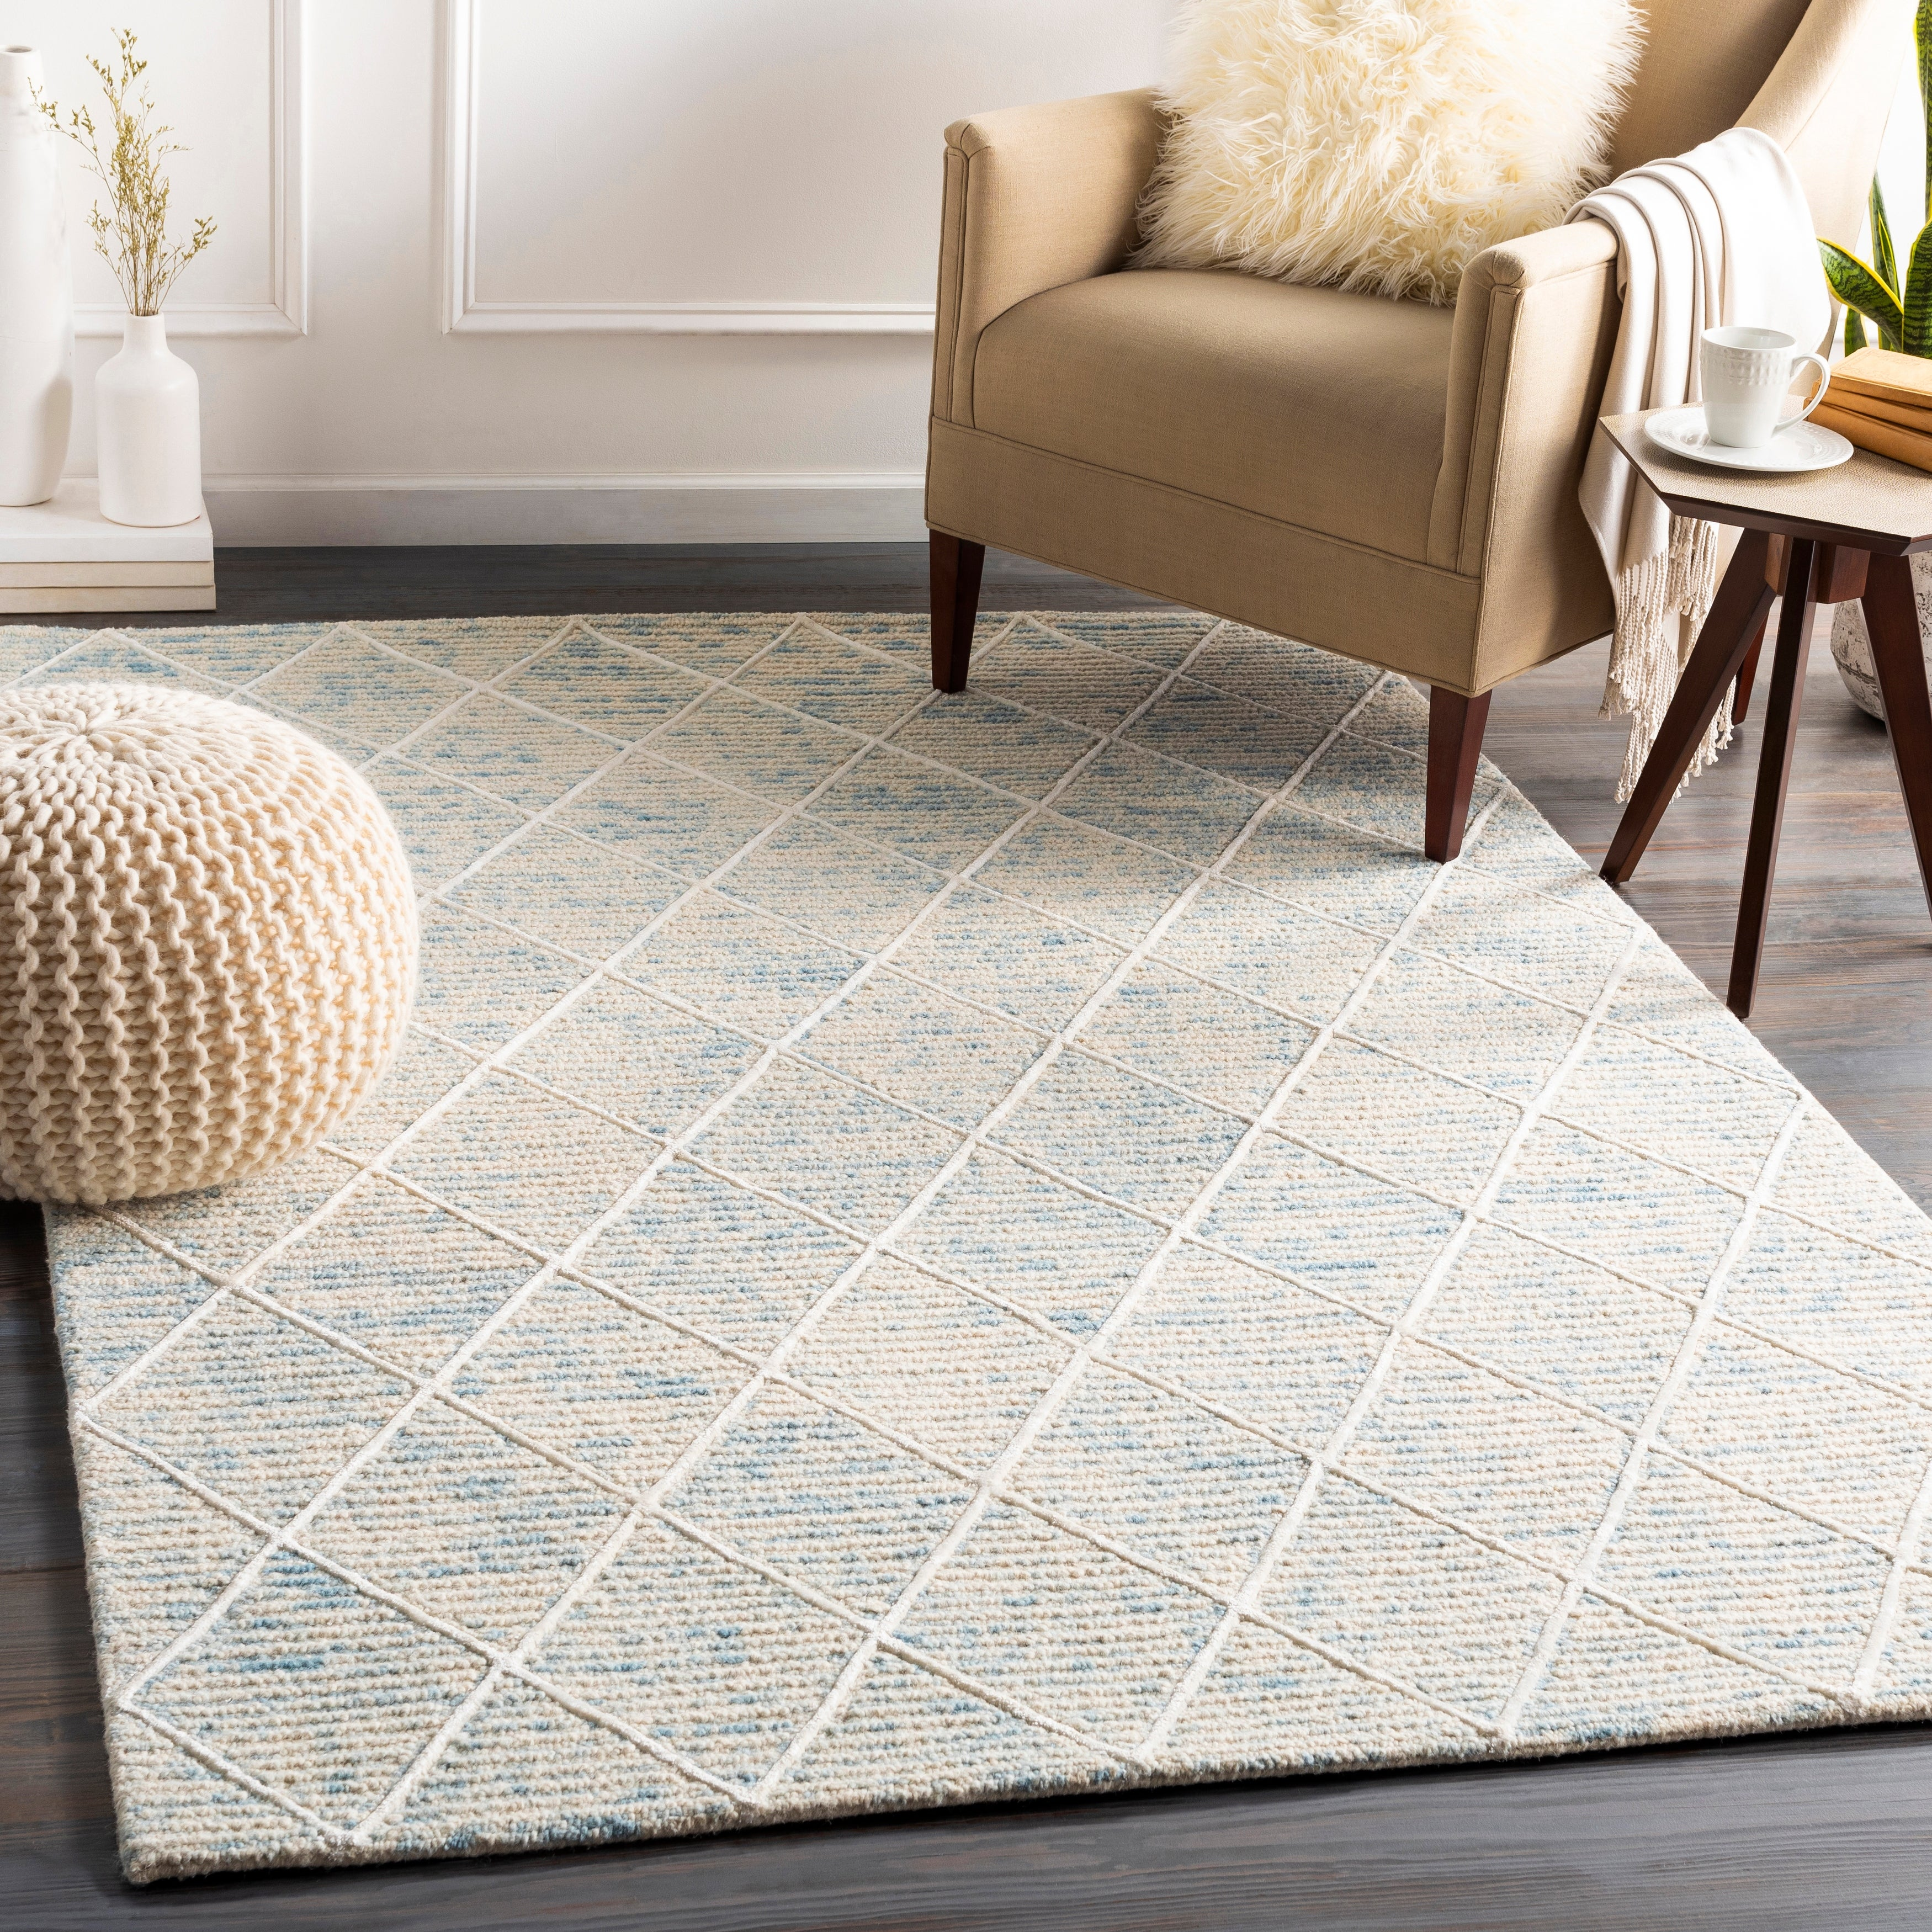 Padstow Handmade Wool Blend Trellis Area Rug On Sale Overstock 29558729